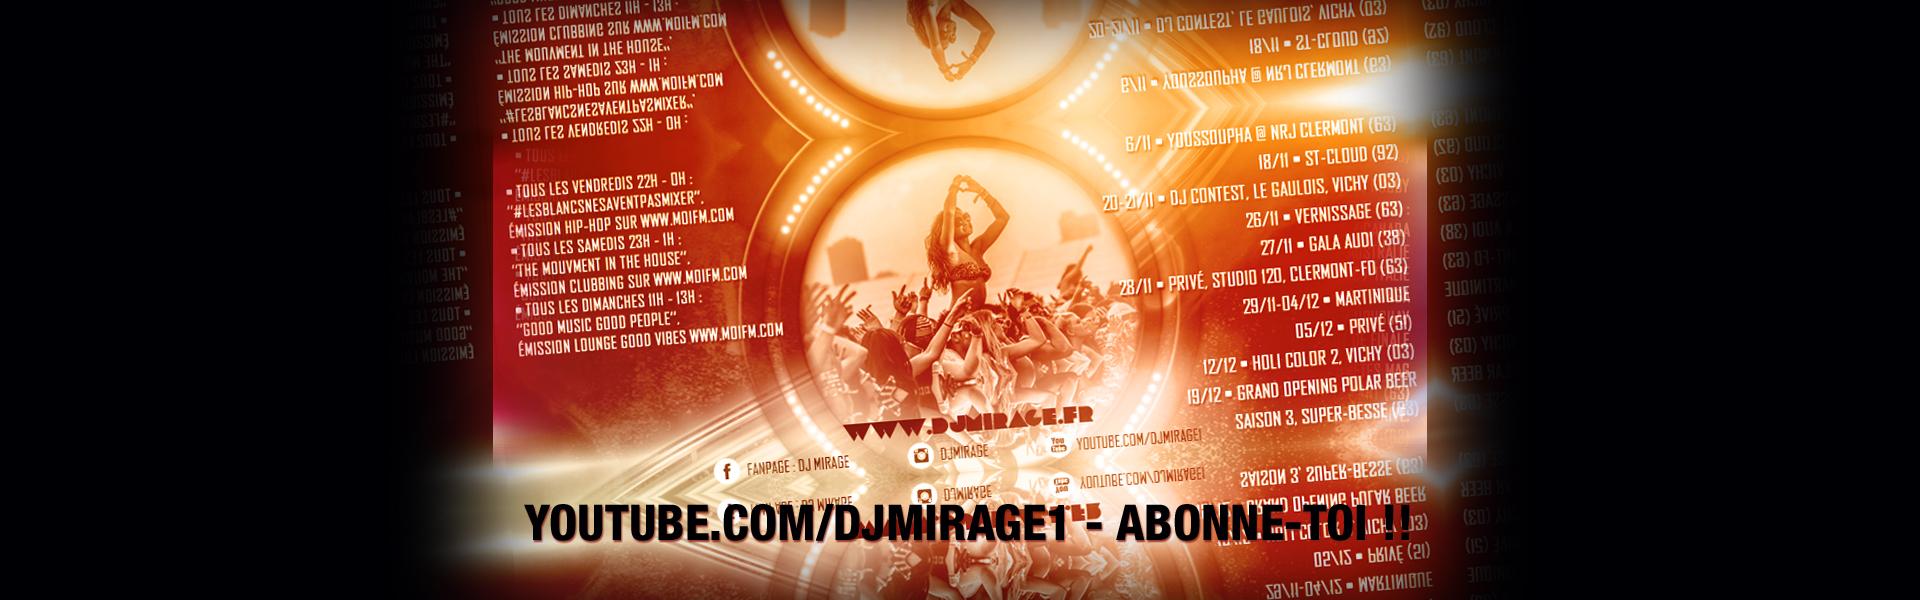 http://djmirage.fr/wp-content/uploads/2014/01/slider-accueil-deejaymirage-novdec15.jpg